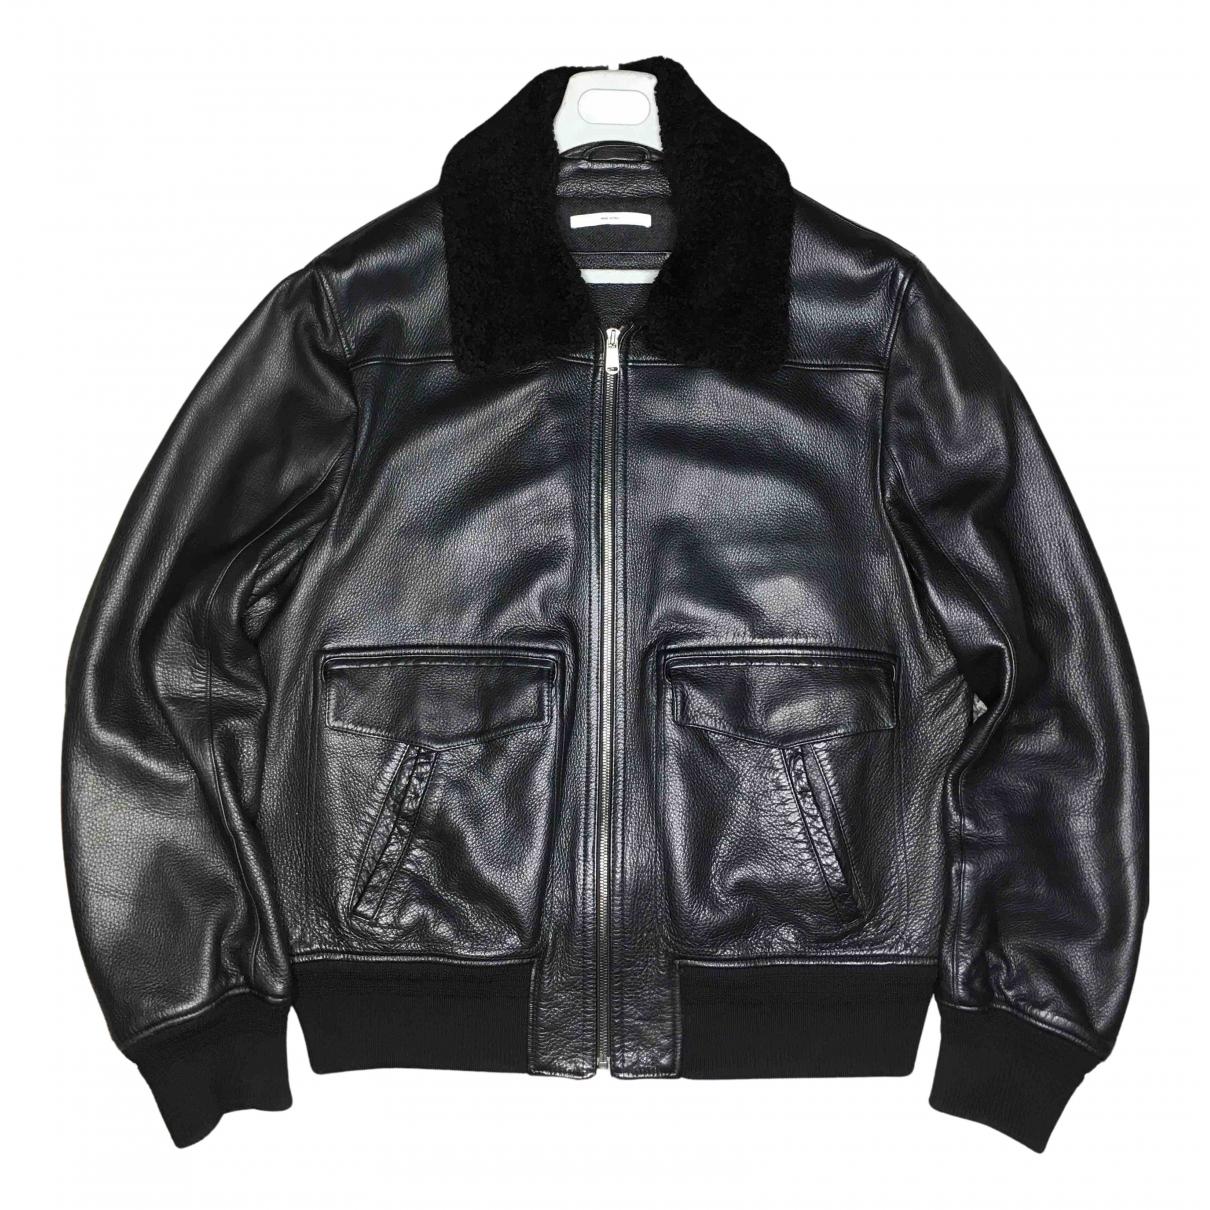 Yves Saint Laurent N Black Leather Jacket for Men